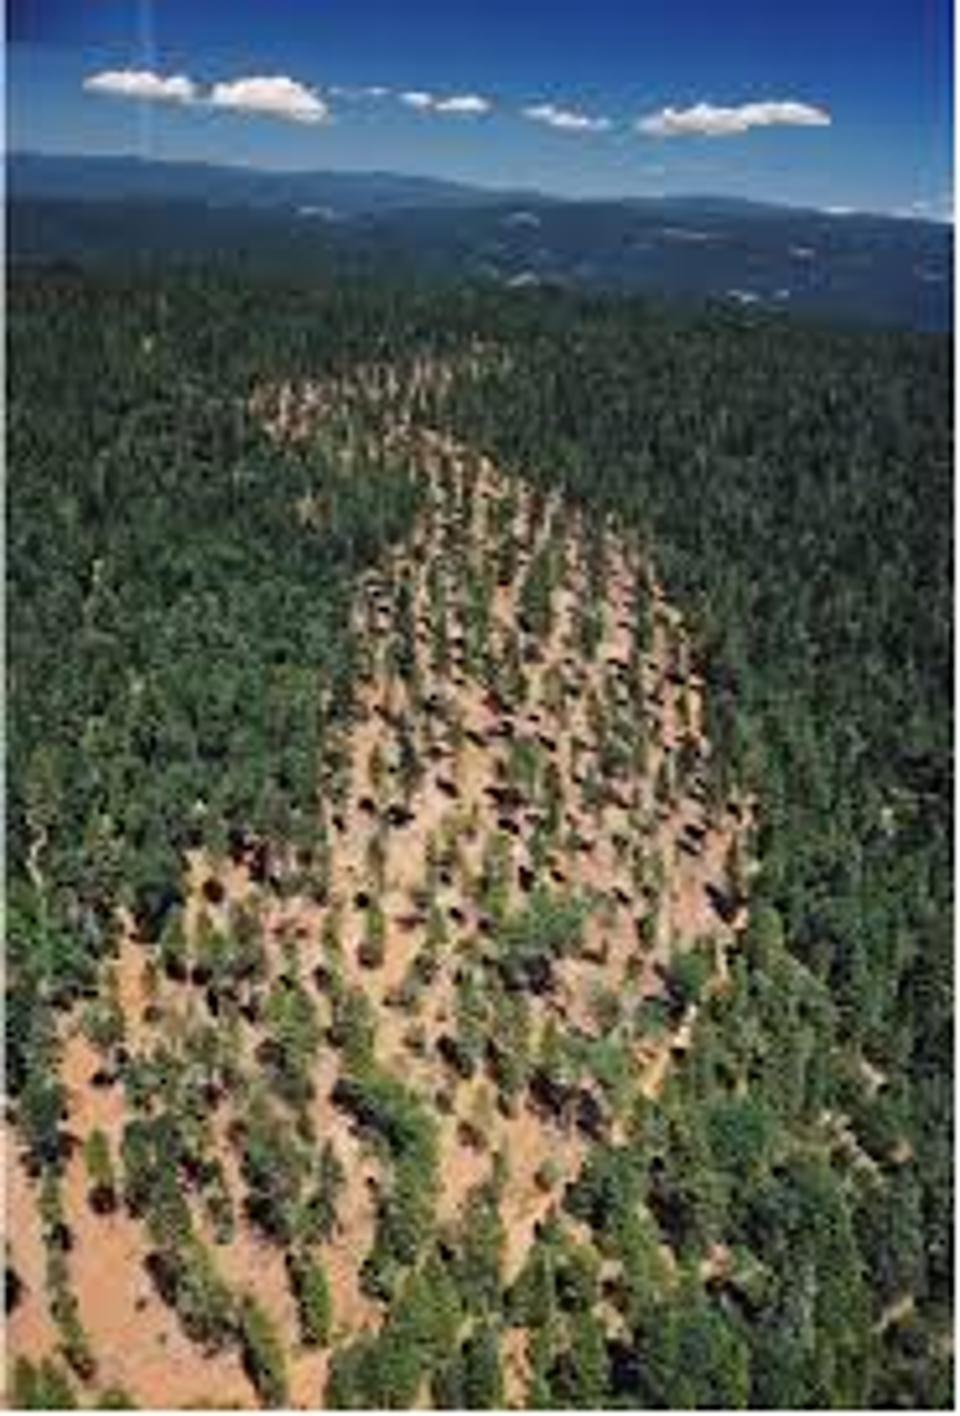 Fire break of thinned trees